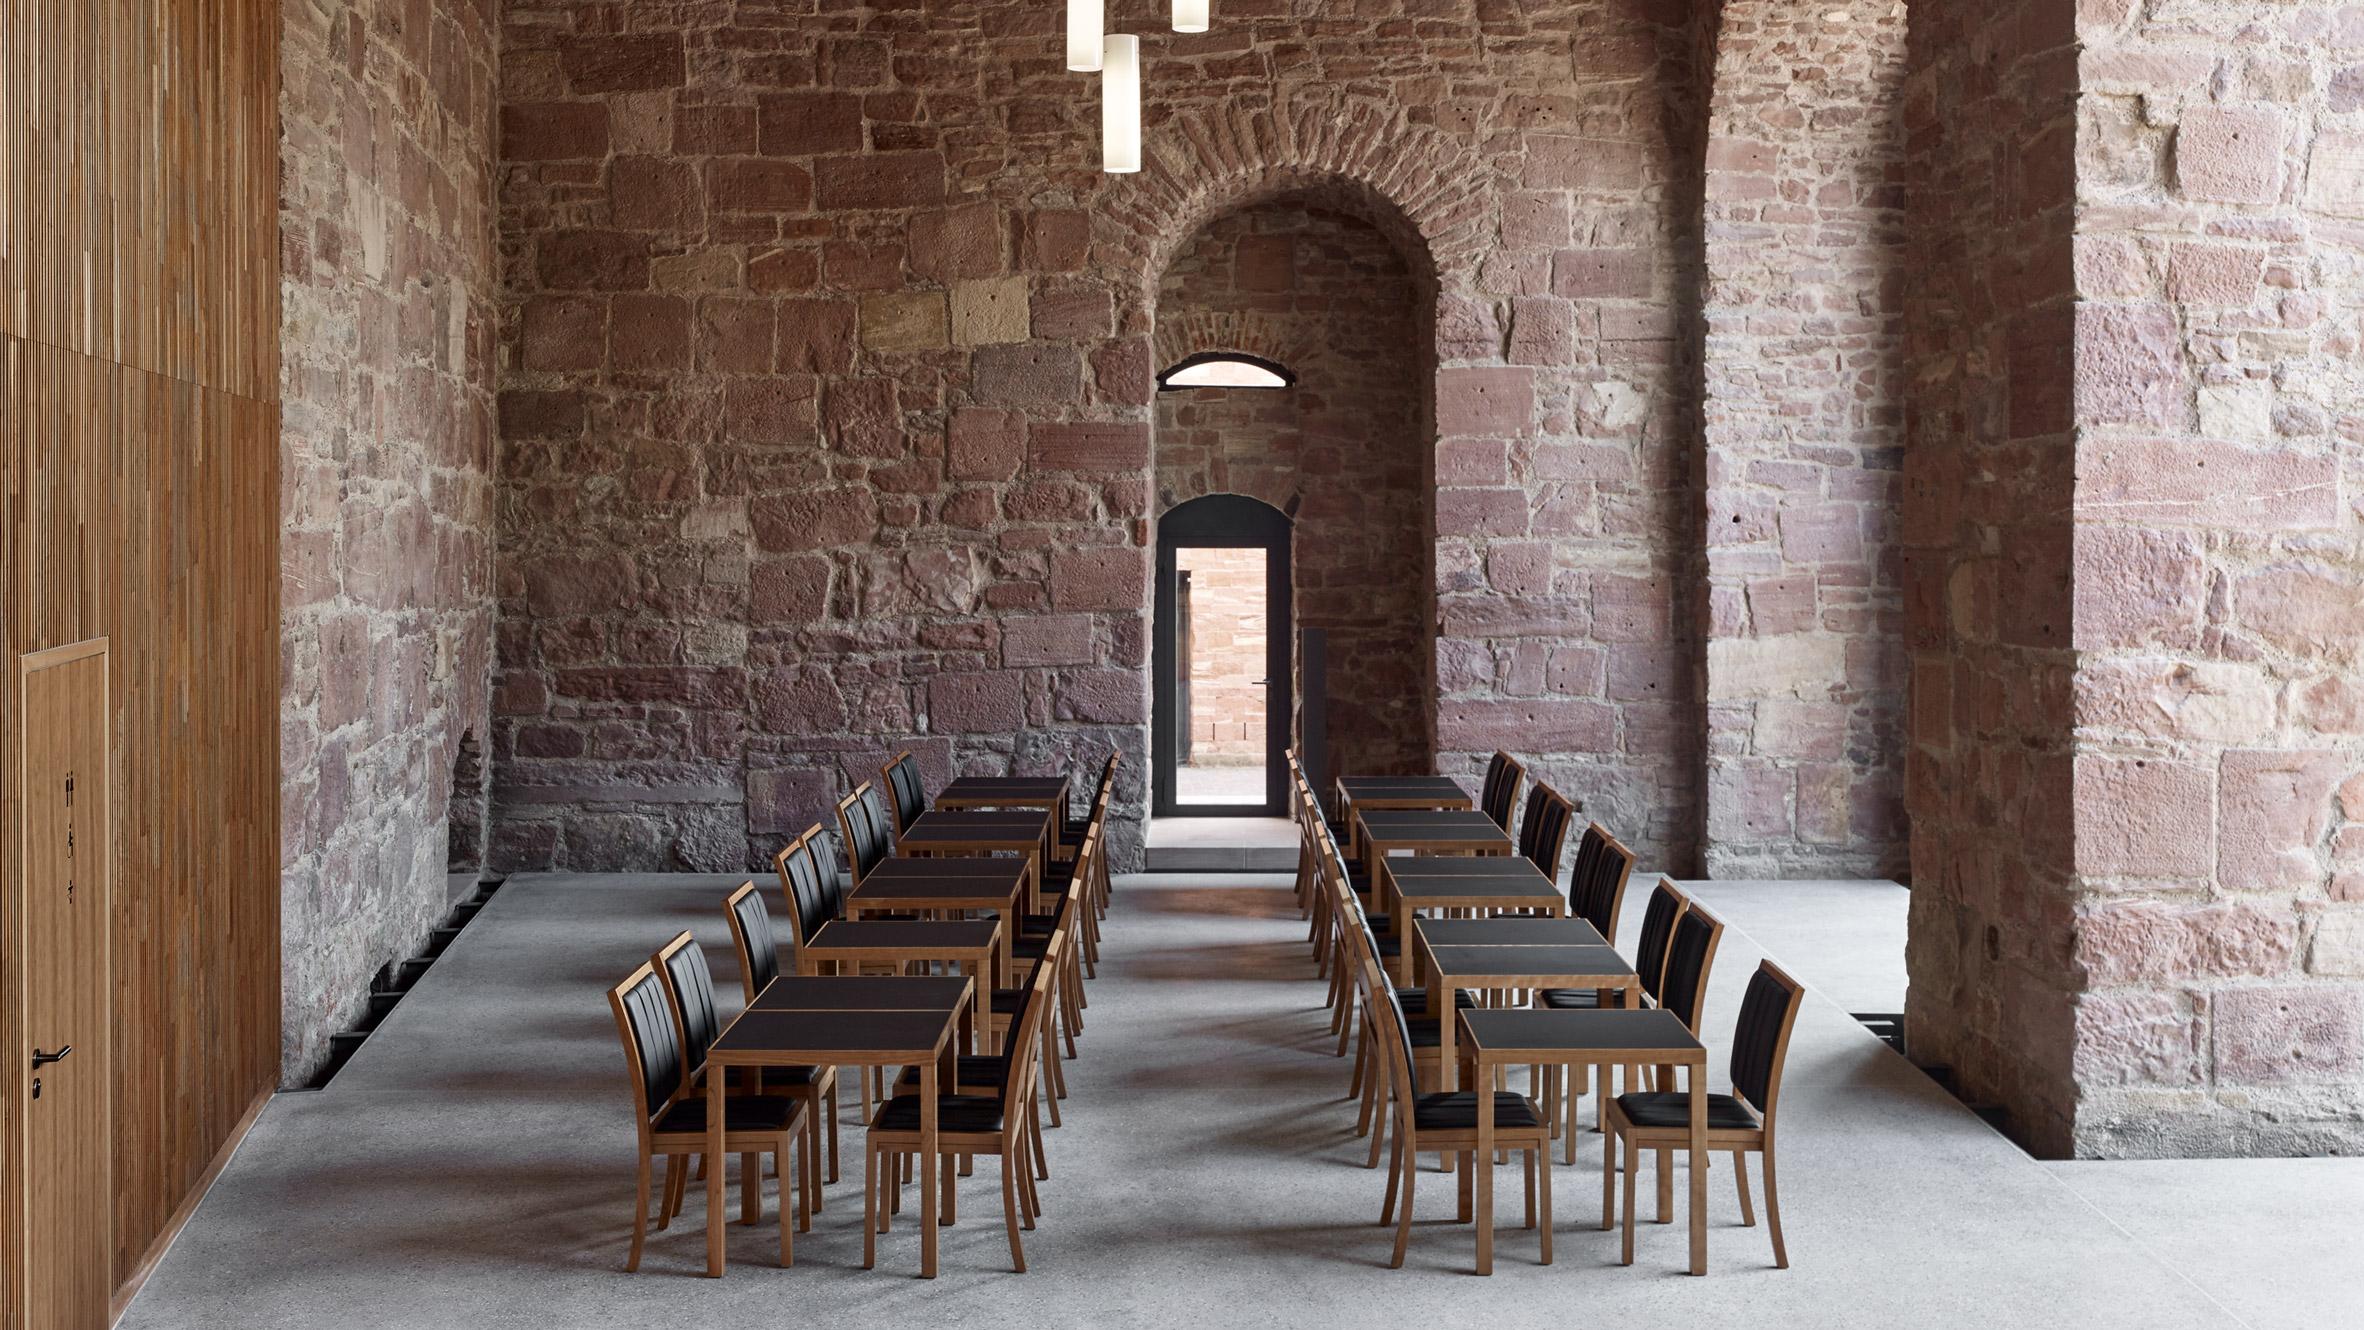 max dudler creates restaurant inside heidelberg castles saddle room